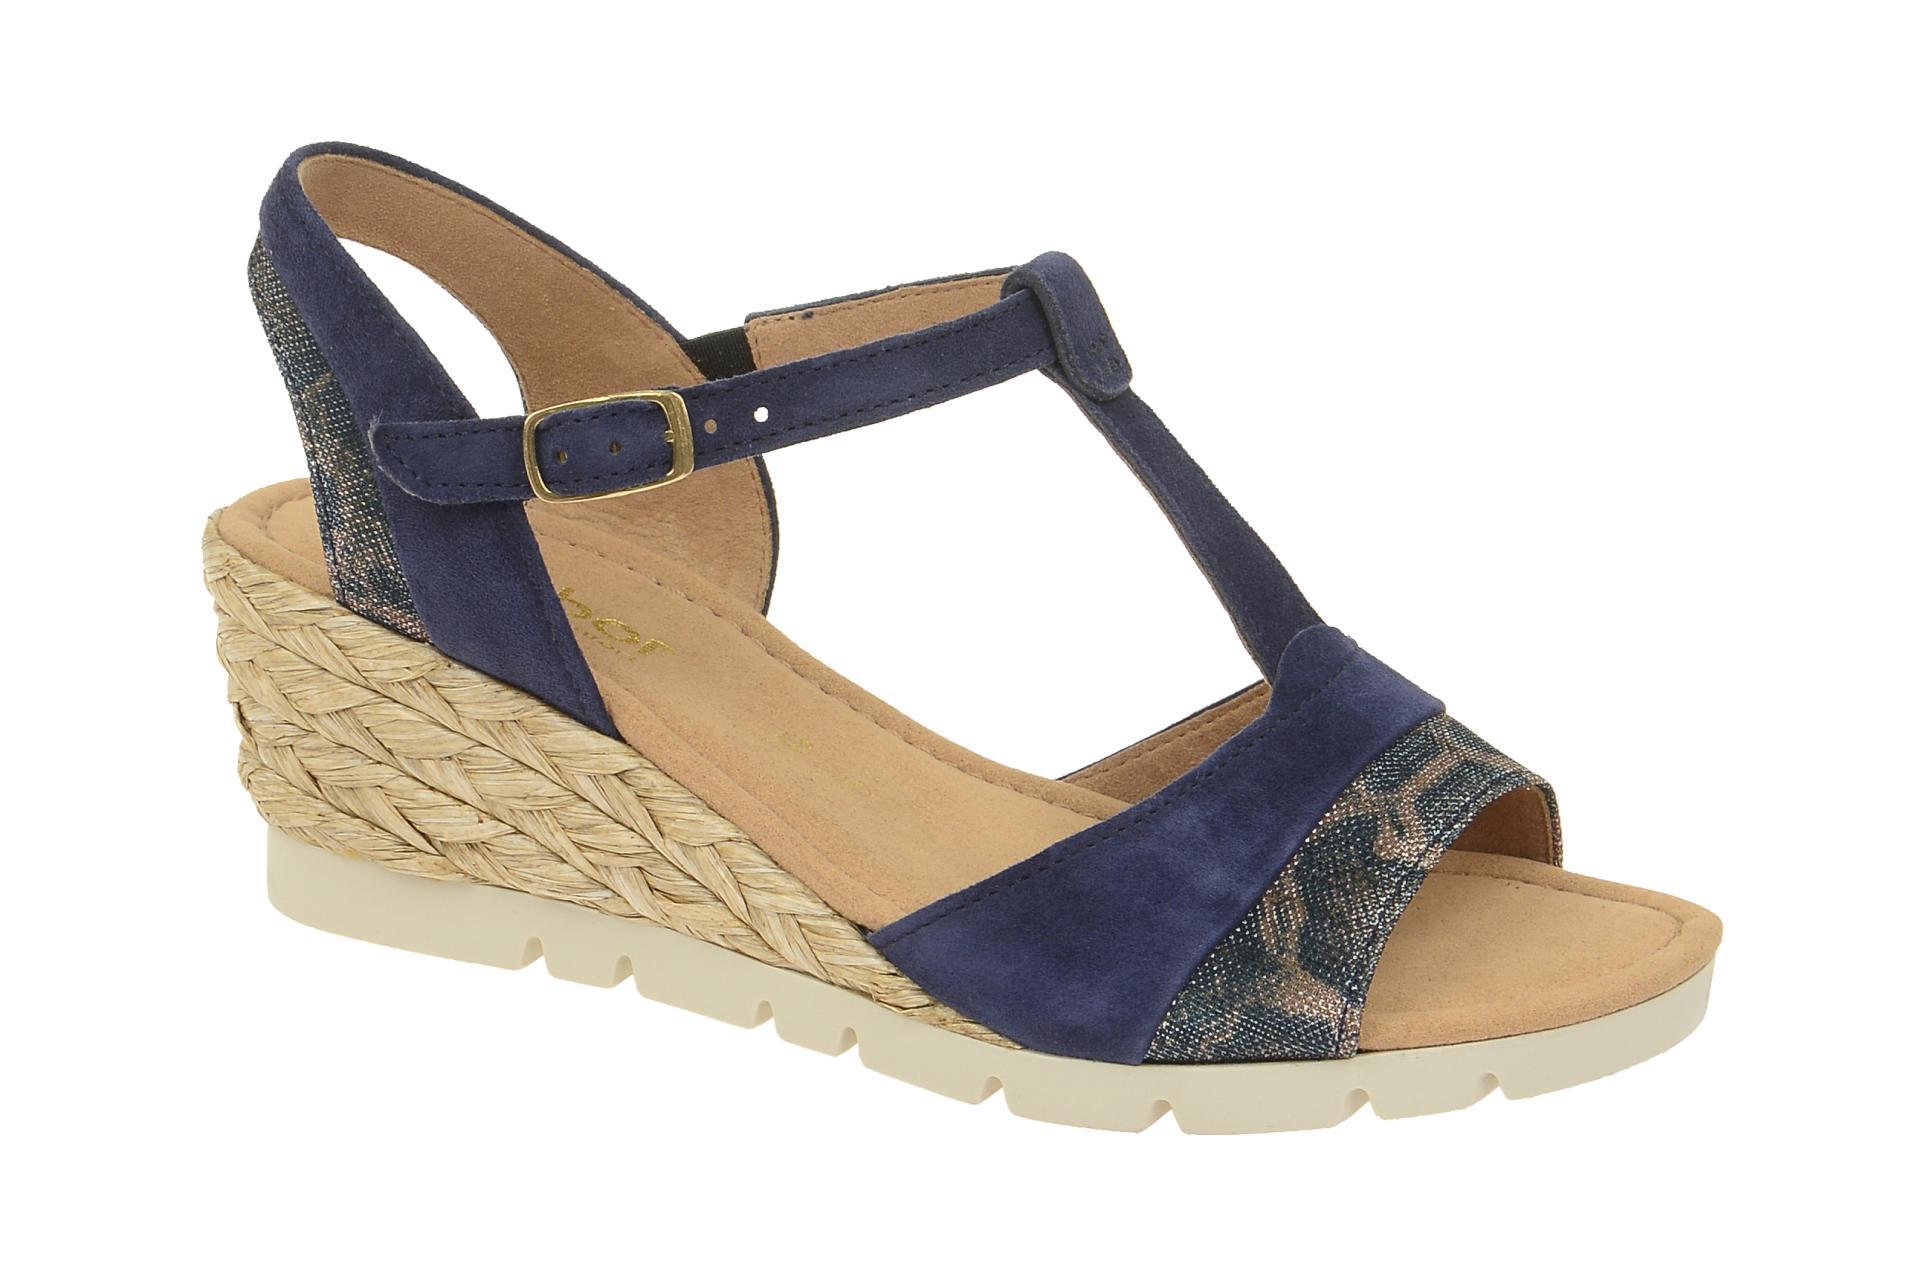 promo code ec6f6 adf52 Details zu Gabor Schuhe TUNIS blau Damen Sandale Sandaletten 62.841.36 NEU